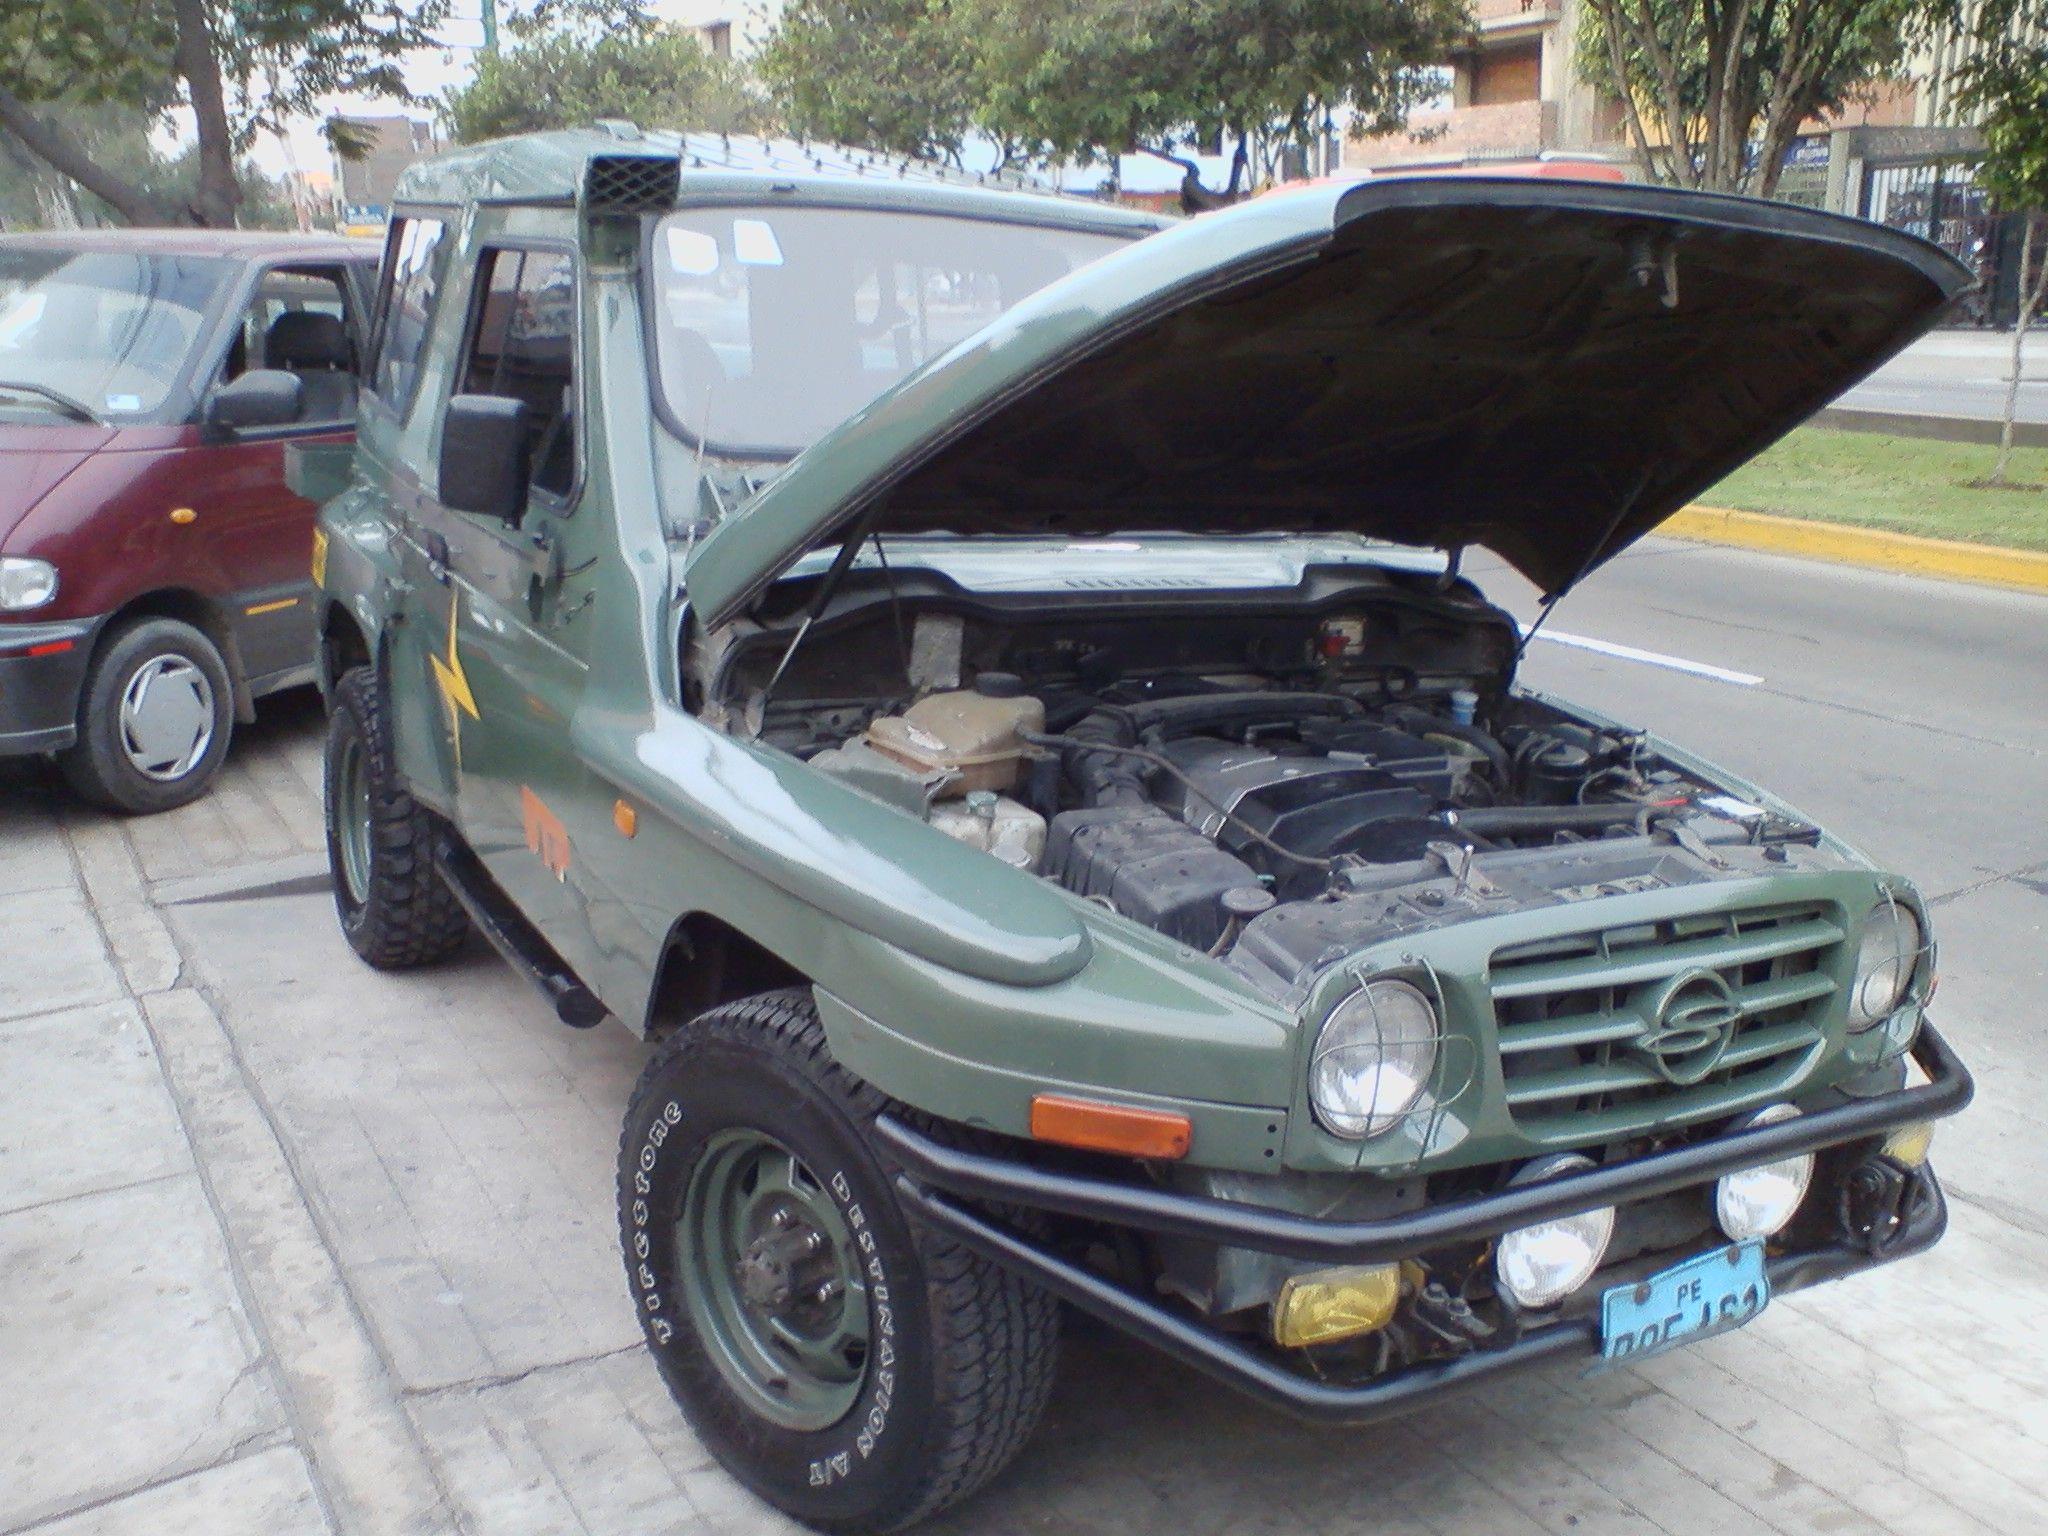 453895d1309706377 Ssangyong Korando 1998 Version Tipo Jeep Militar Sist Dual Glp 5ta Generacion 057 Jpg 2 048 1 536 Pixels Jeep Bus Engine Car